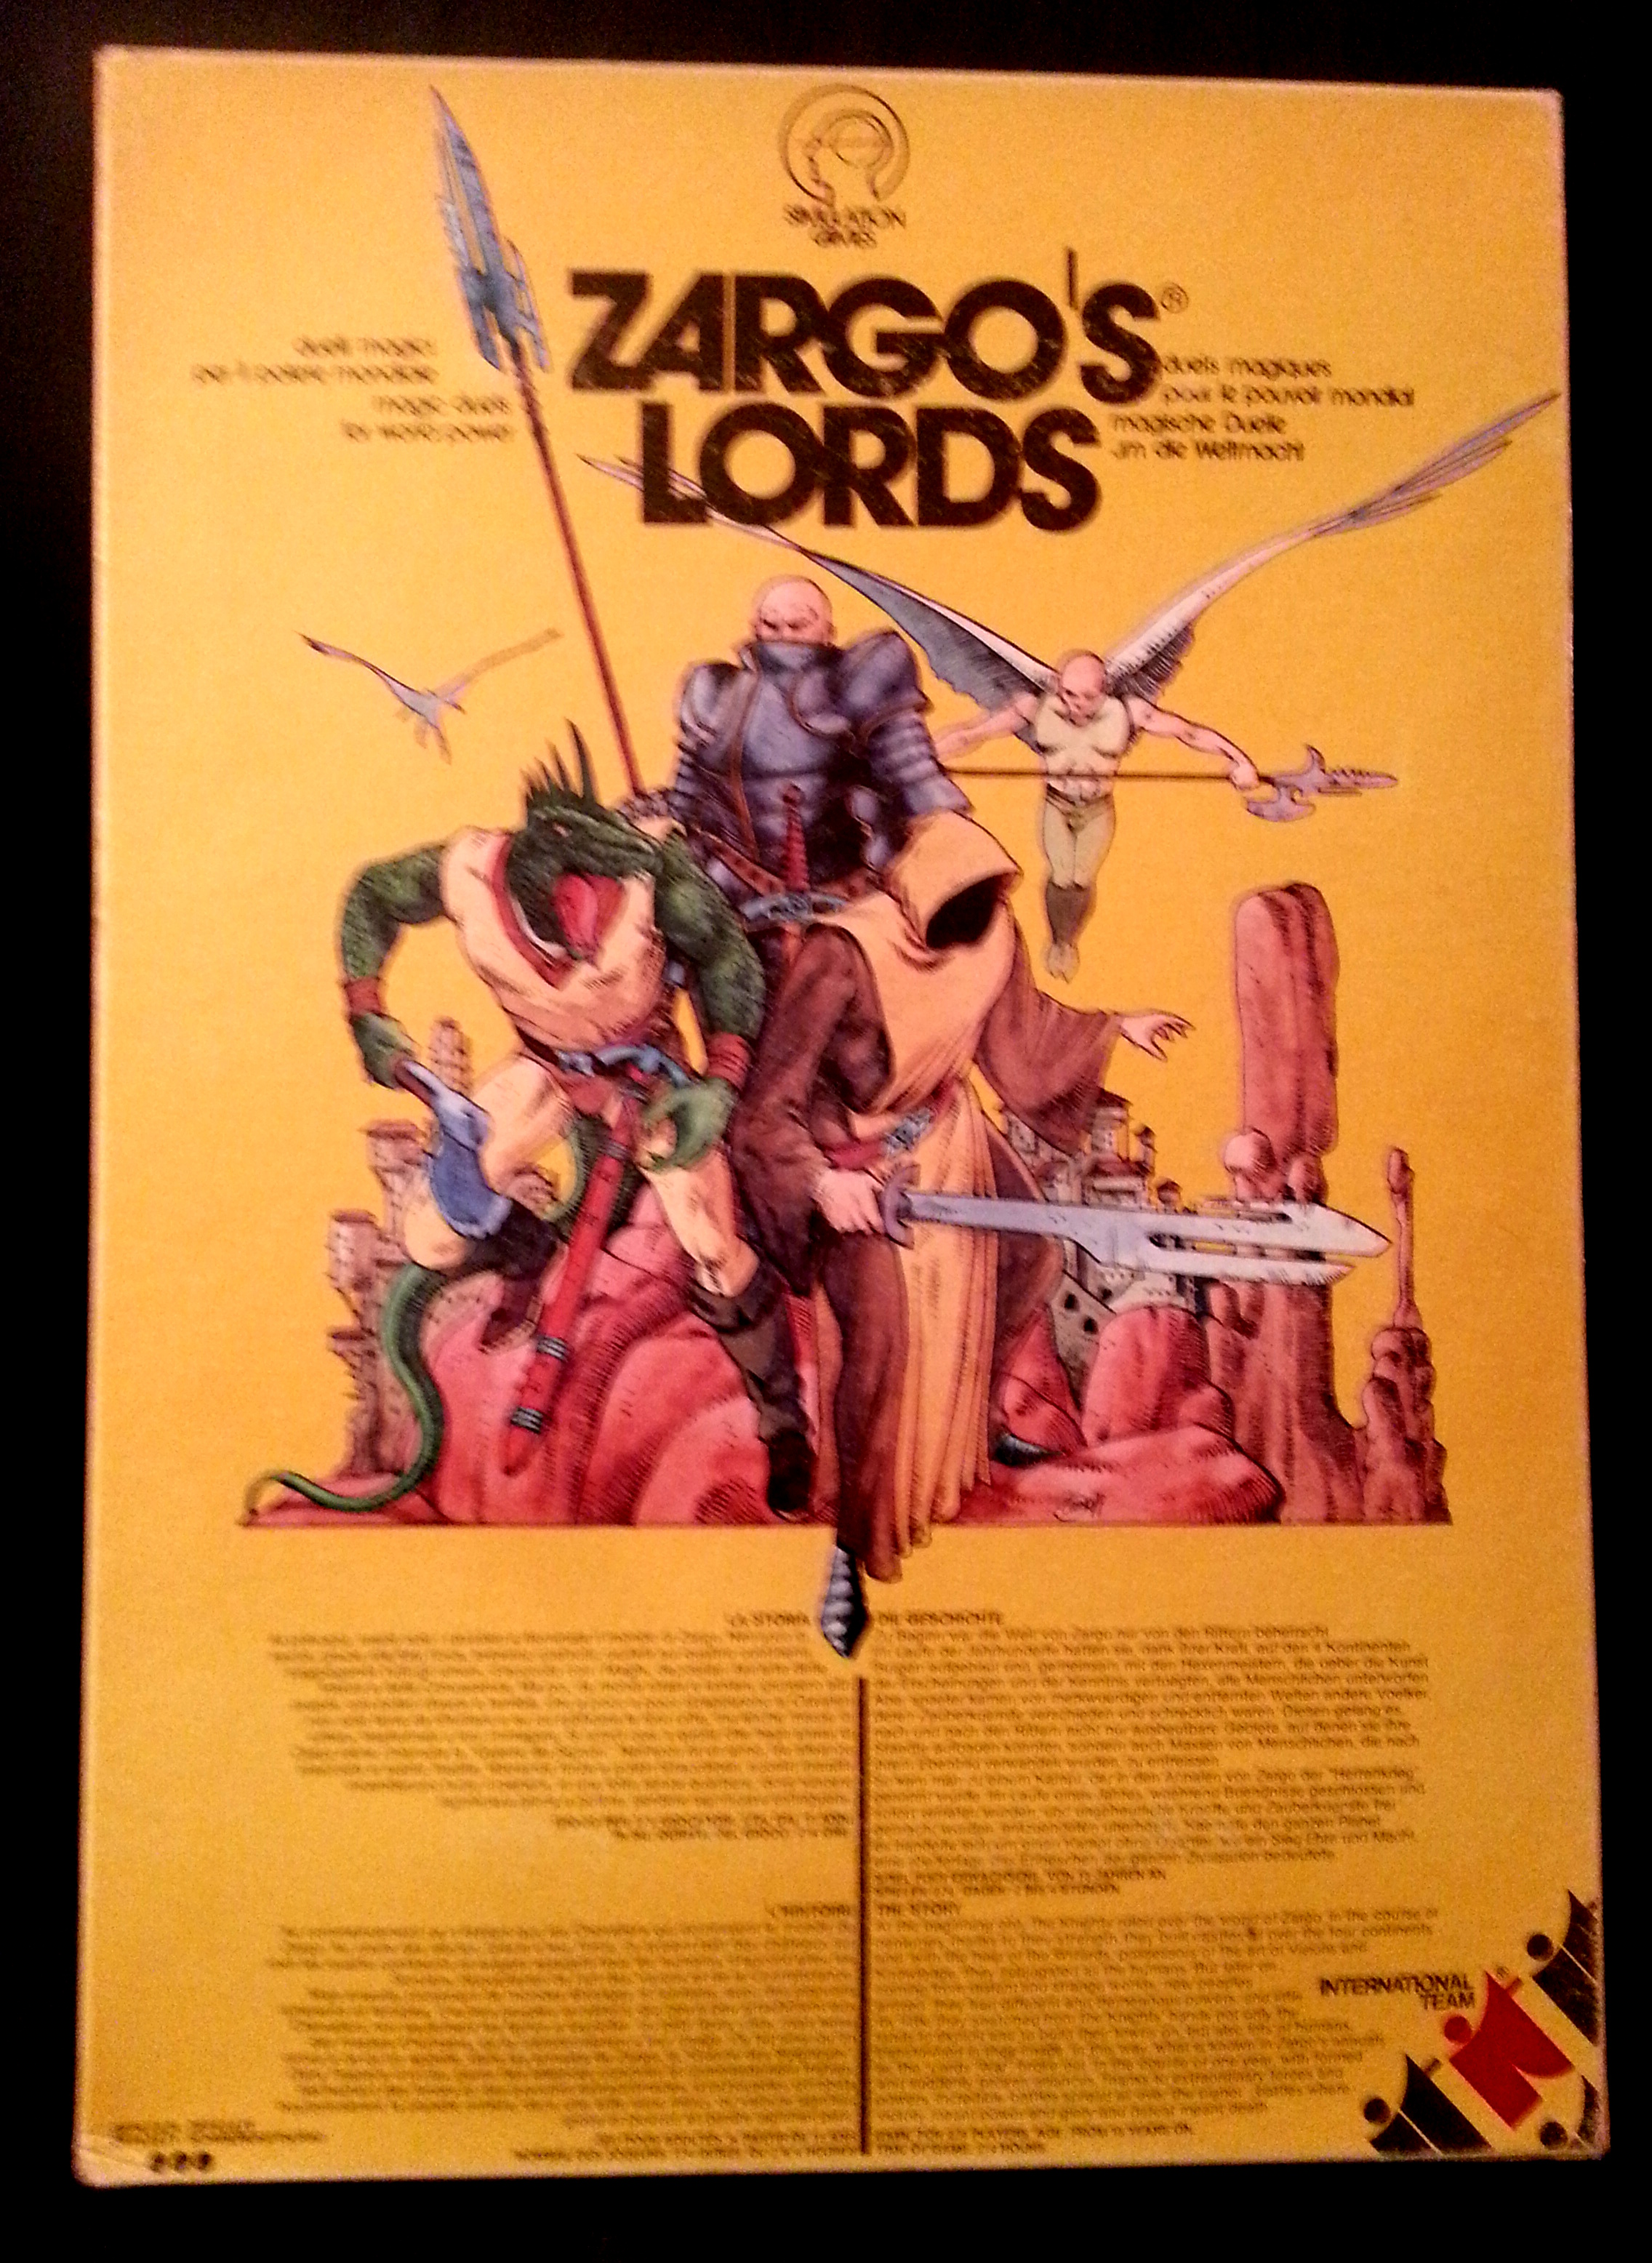 CERCO Gioco da tavola Zargo's Lords Zargo-copertina